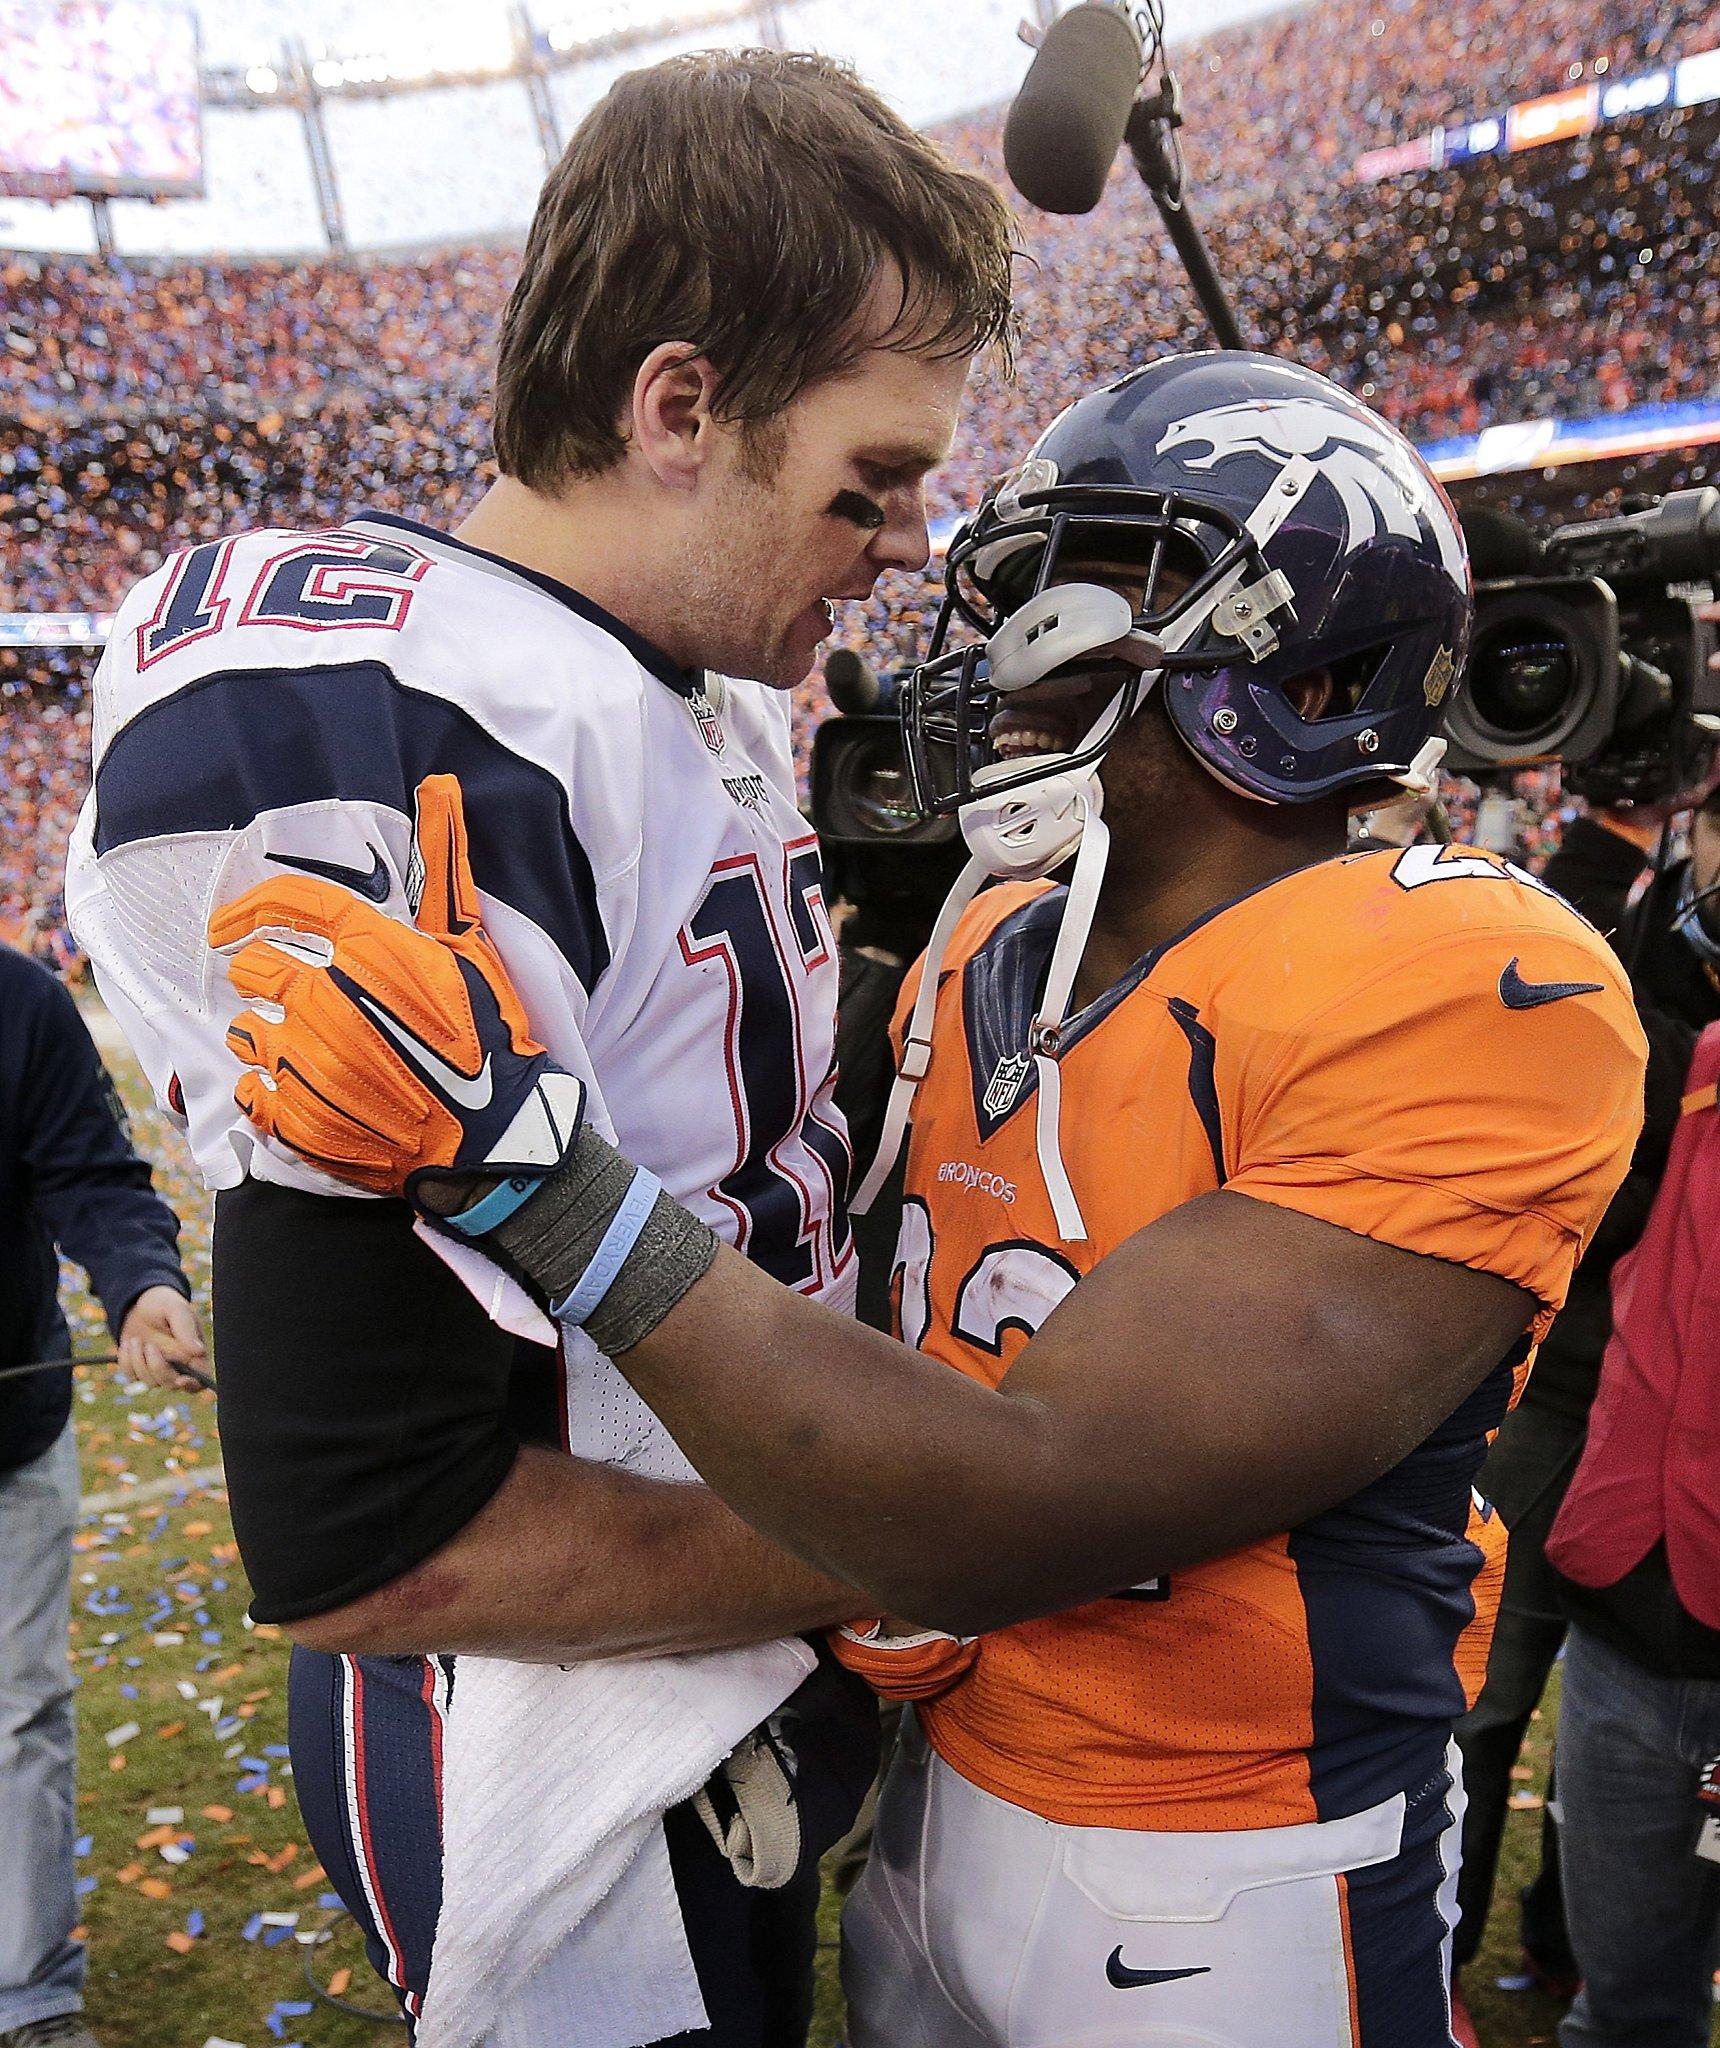 Patriots' Tom Brady and Broncos' C.J. Anderson share a moment - SFGate